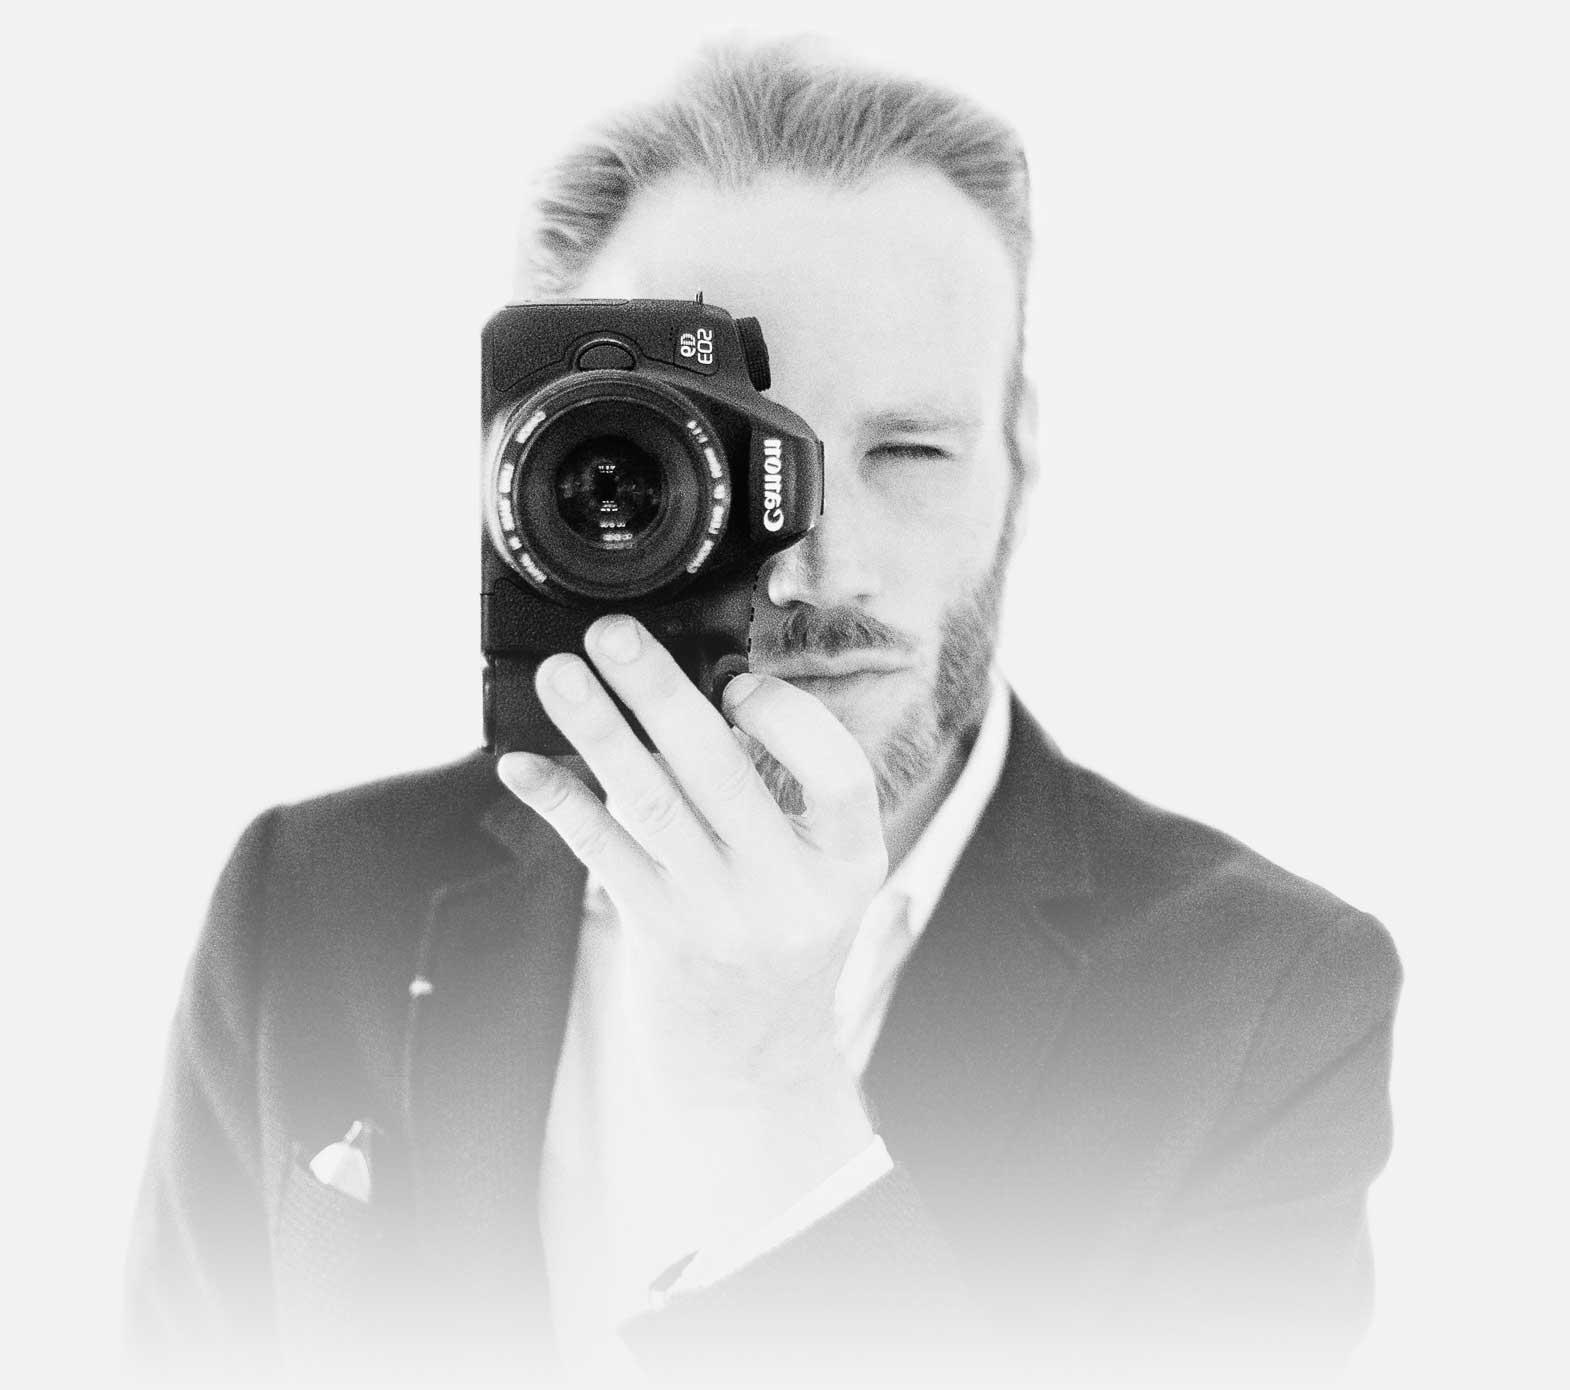 Portrait of Christian Hagen